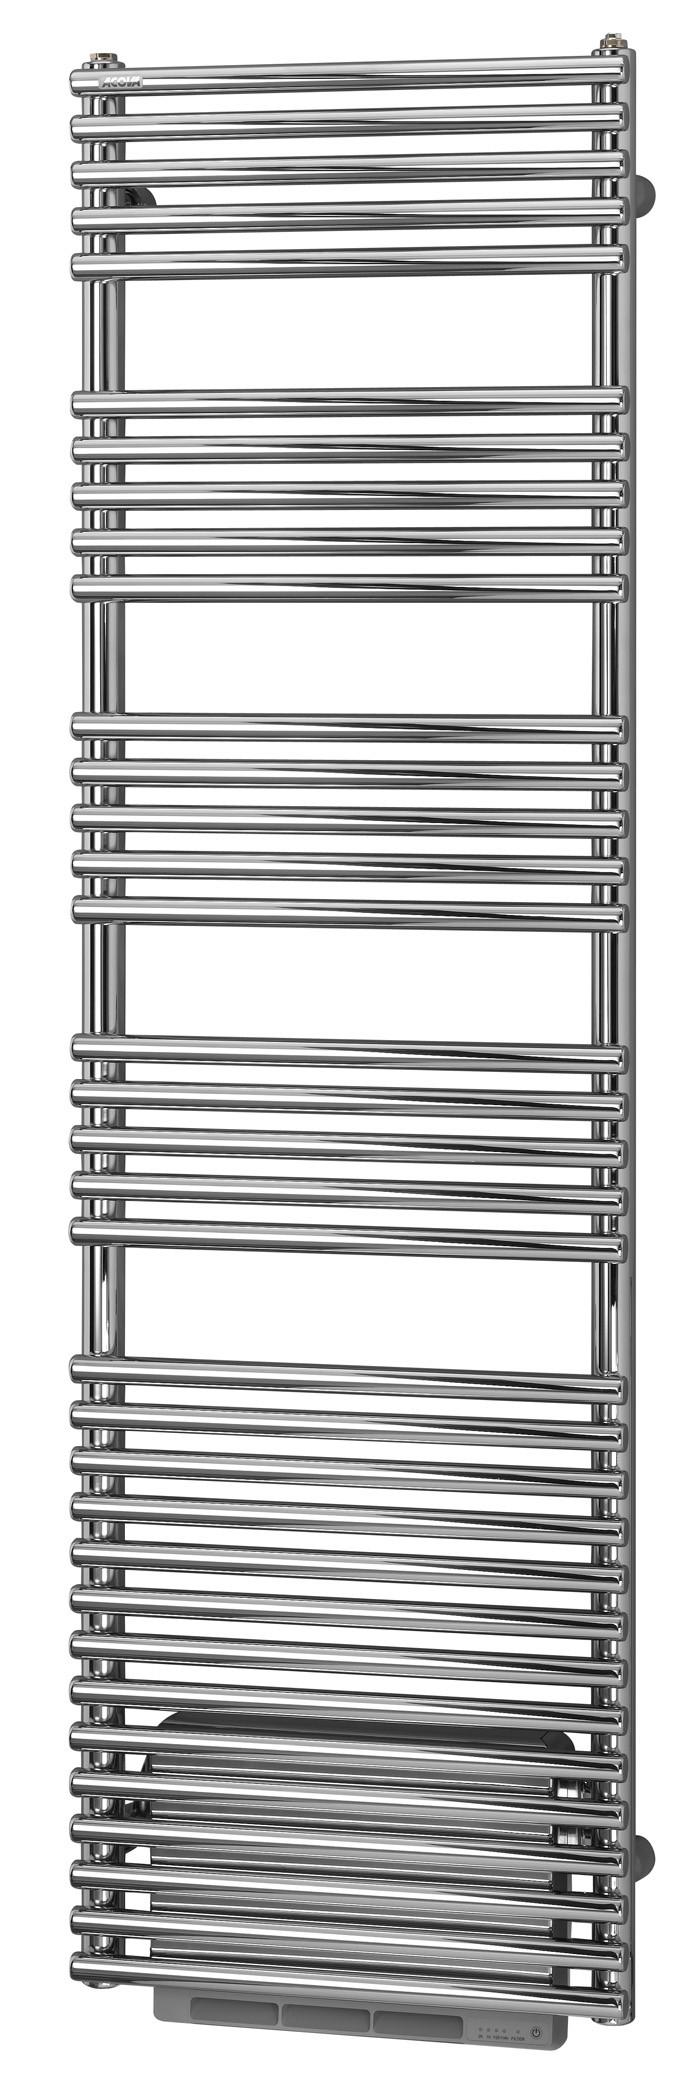 radiateur a inertie seche serviette acova cala soufflant. Black Bedroom Furniture Sets. Home Design Ideas